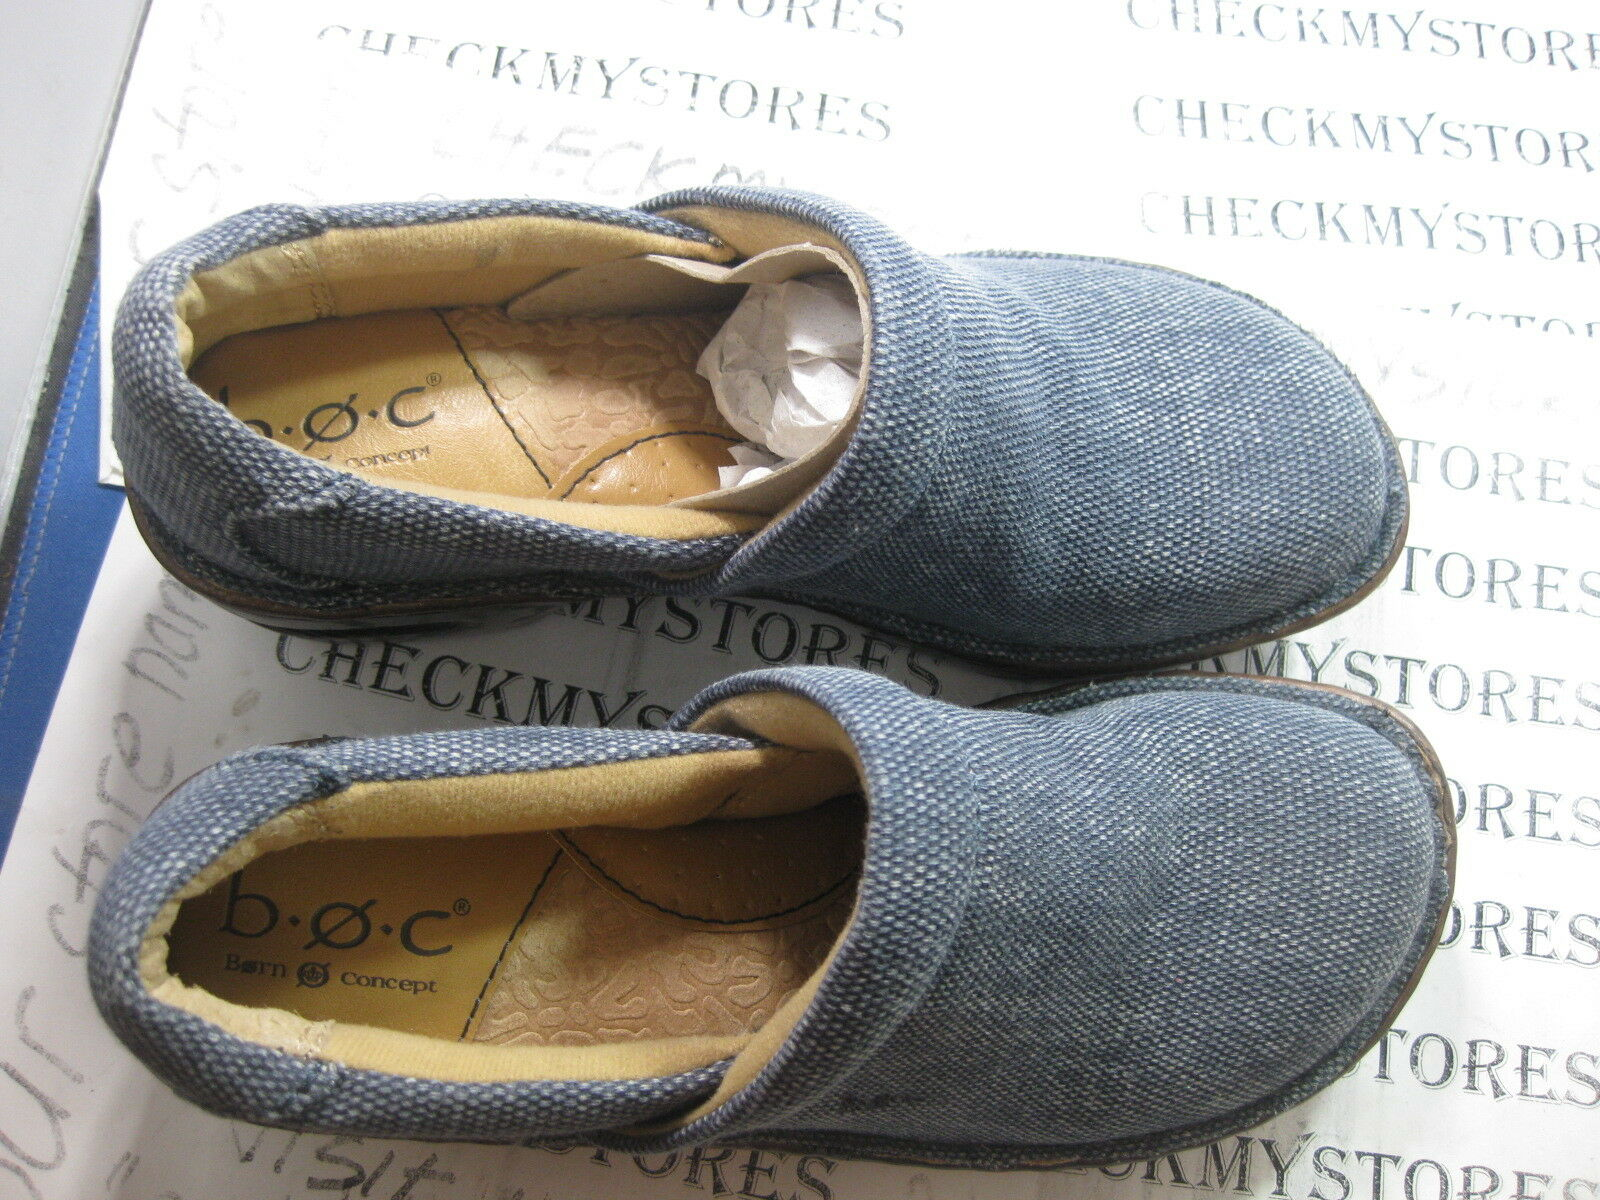 NEW NIB  B.O.C B.O.C  Boc Born Concept Margaret premium comfort  Clogs C130154 C13037 7e884a